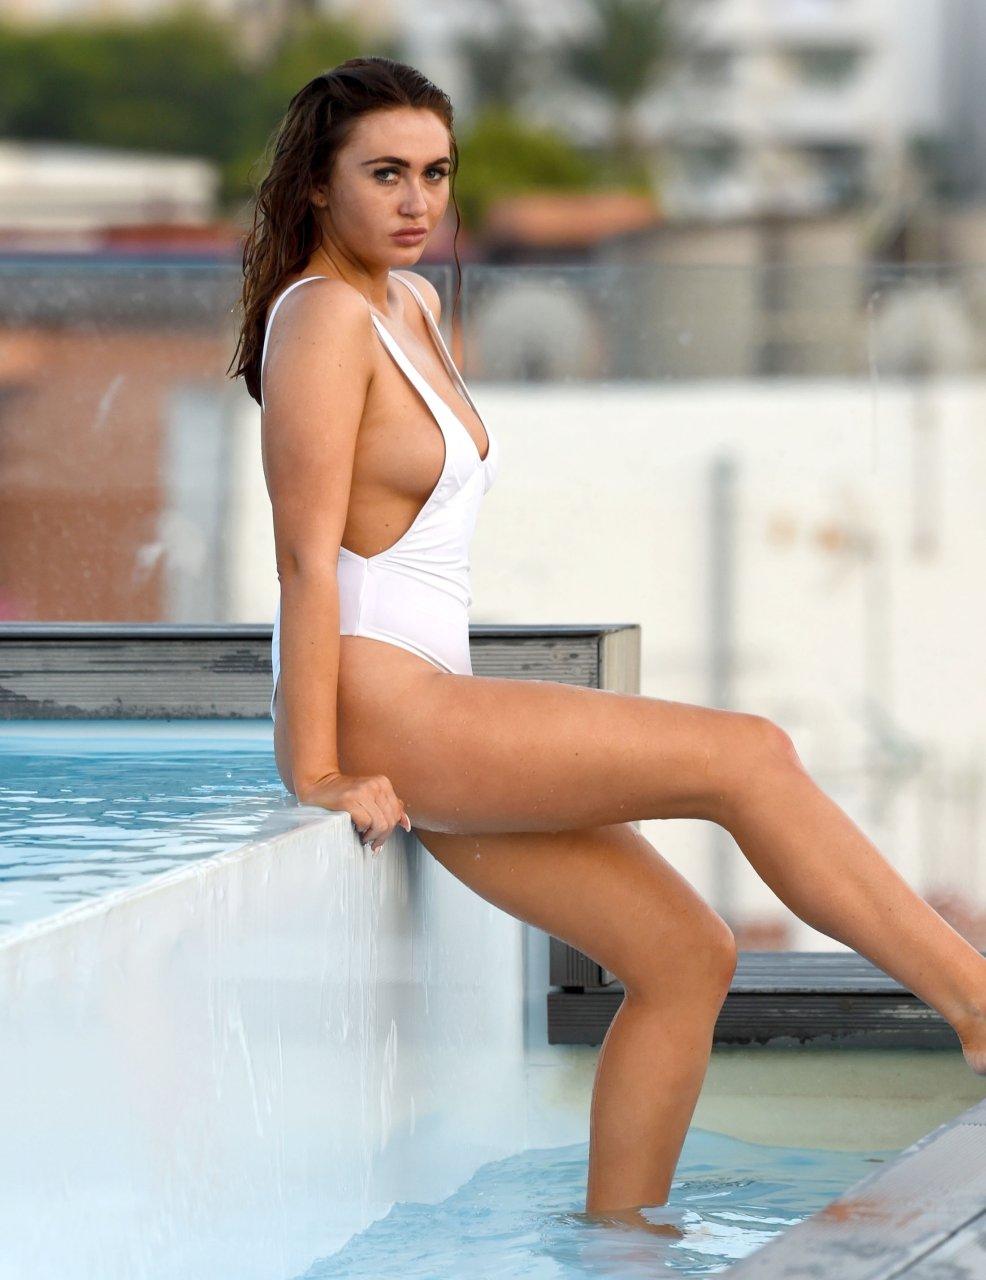 charlotte dawson naked